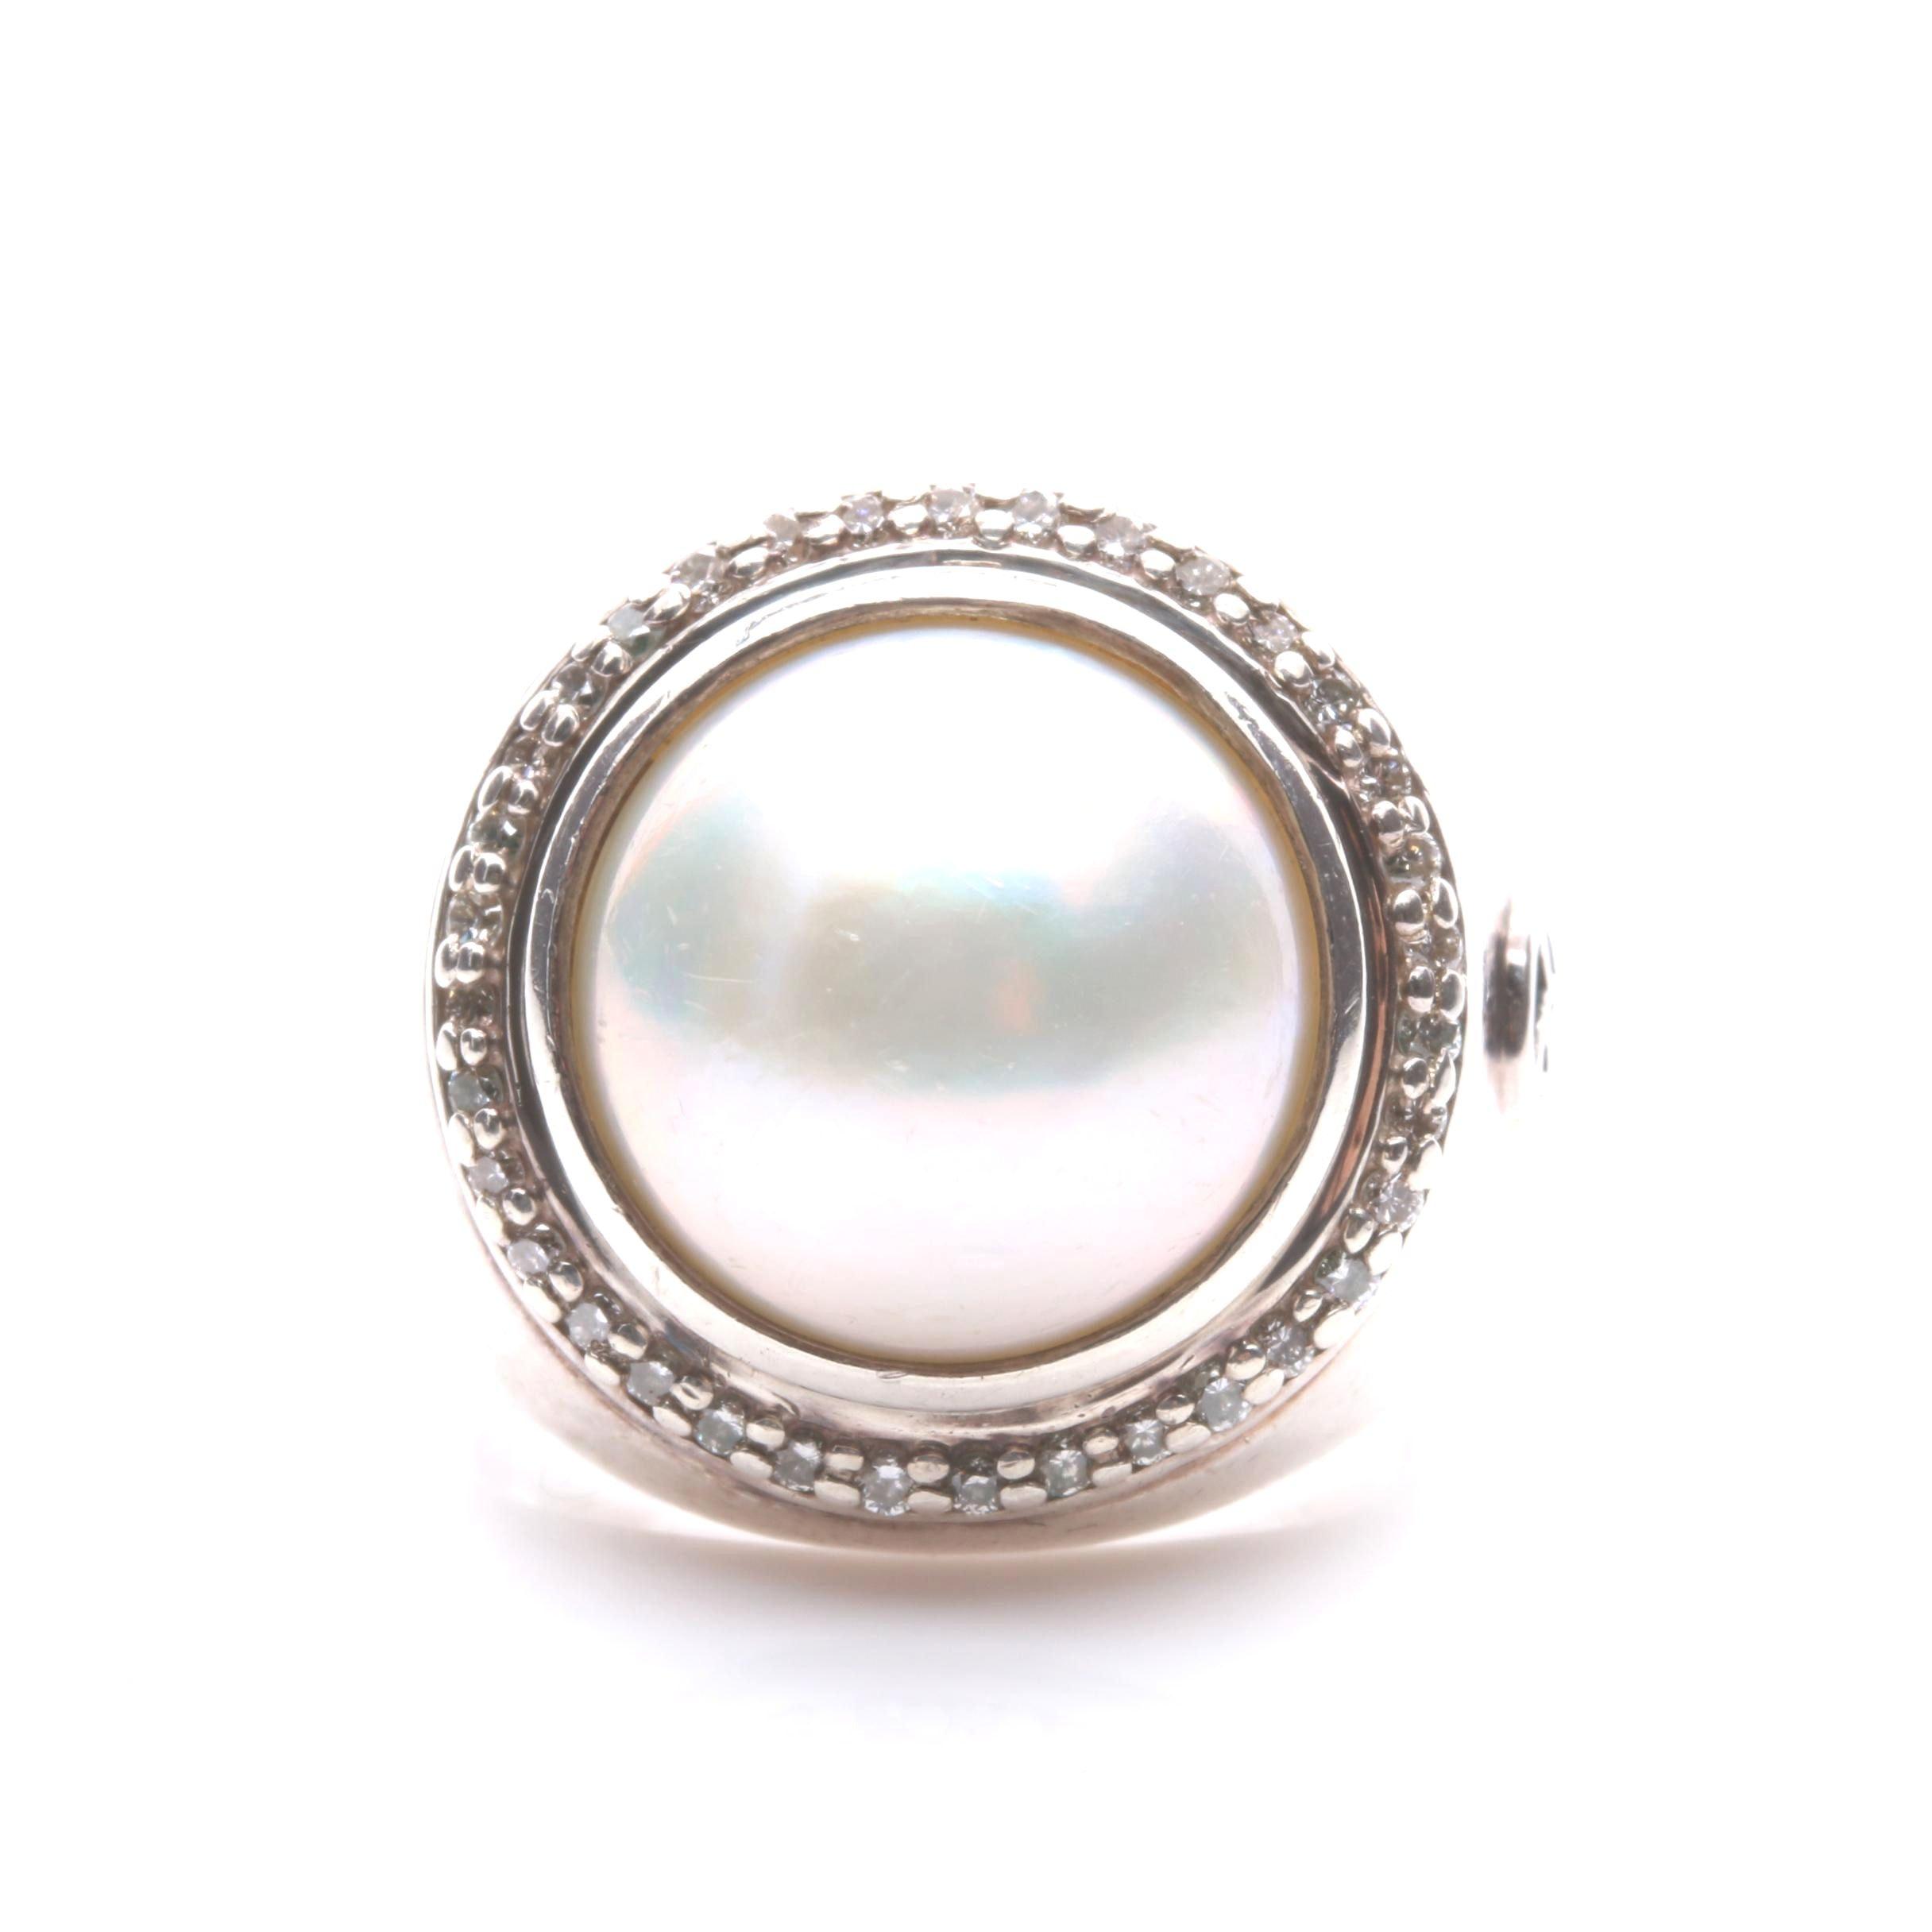 David Yurman Sterling Silver Cultured Mabé Pearl and Diamond Ring